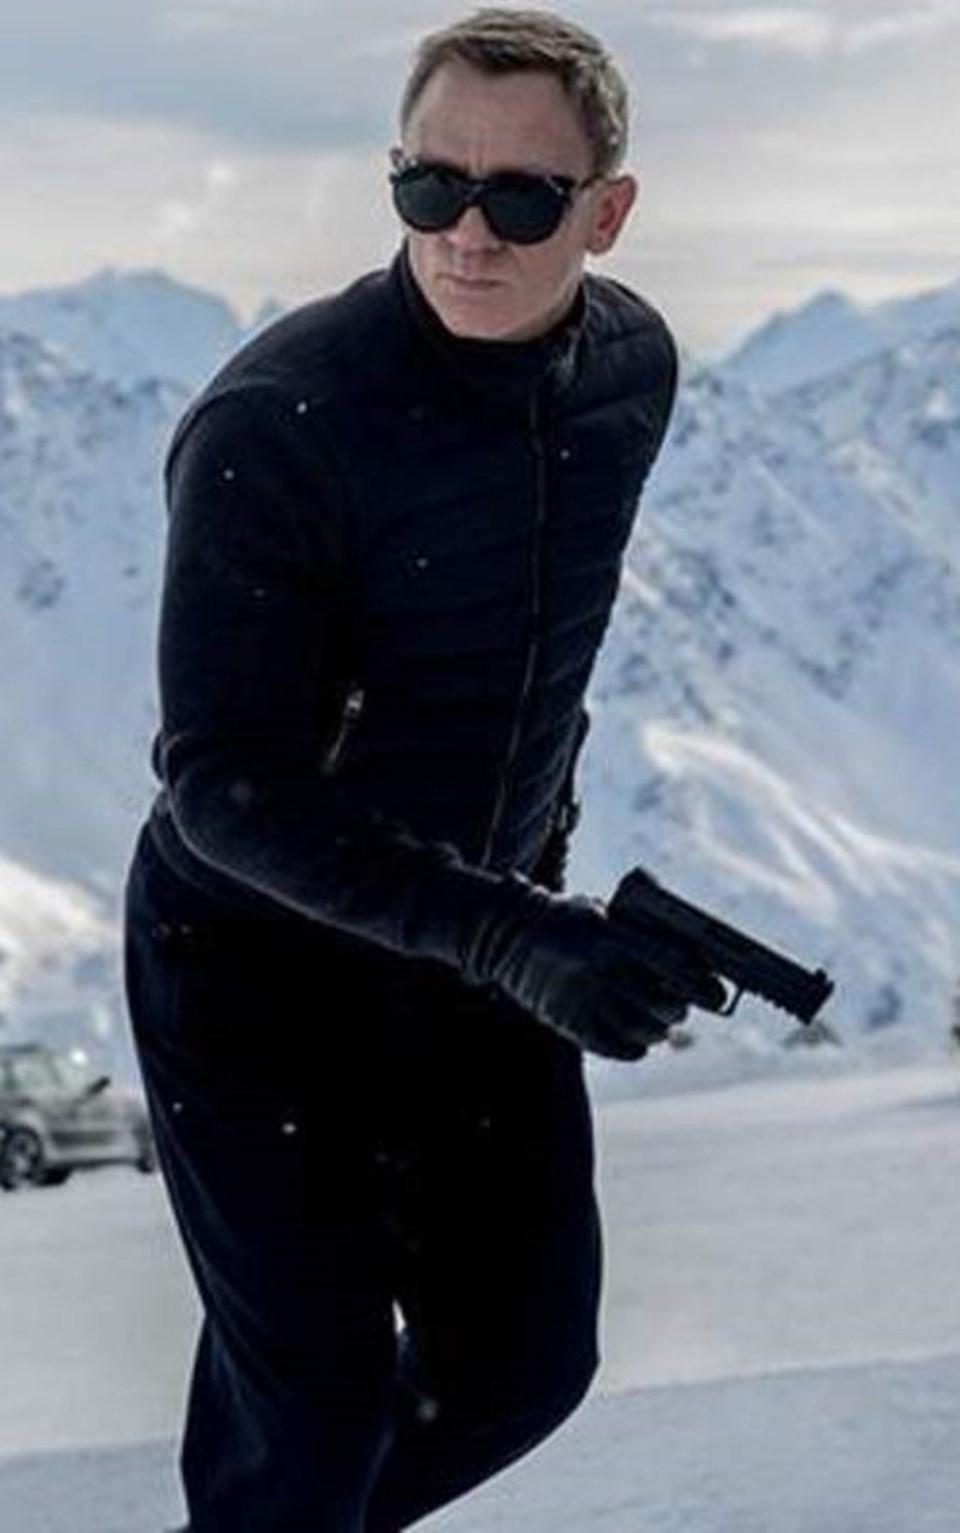 Serinin sonfilminde oynayan Daniel Craig, 4. kez James Bondoldu.